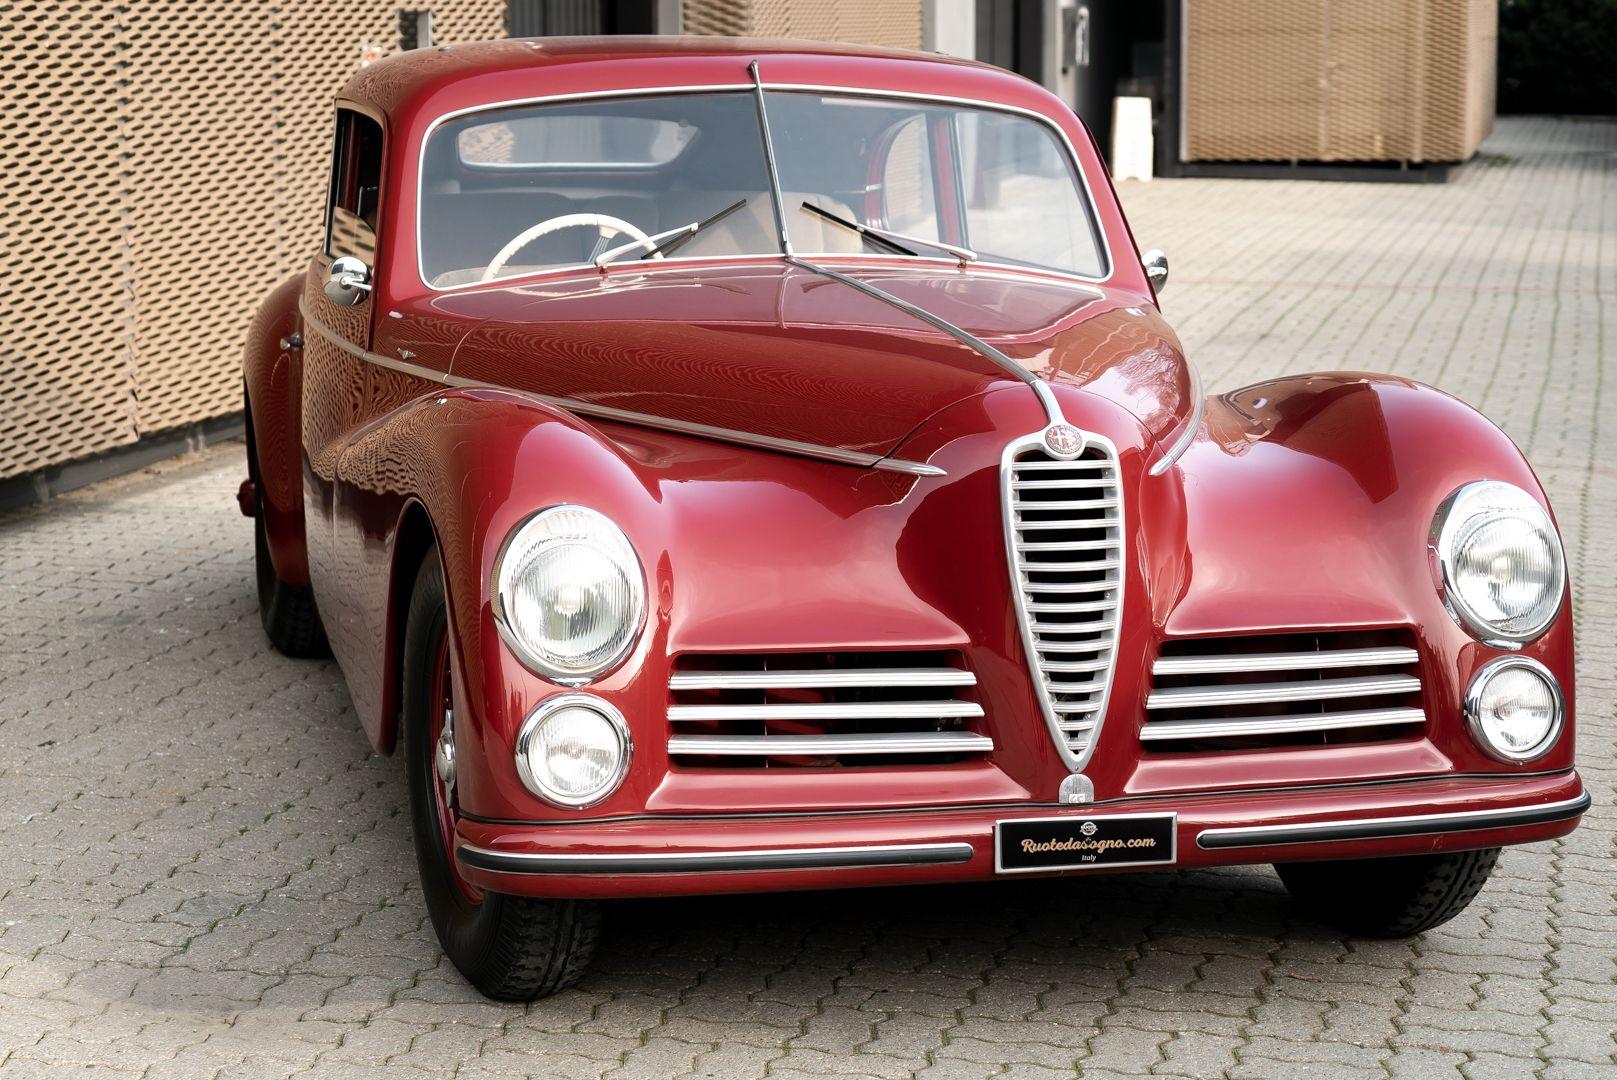 1947 Alfa Romeo Freccia d'oro 6C 2500 Sport 61680